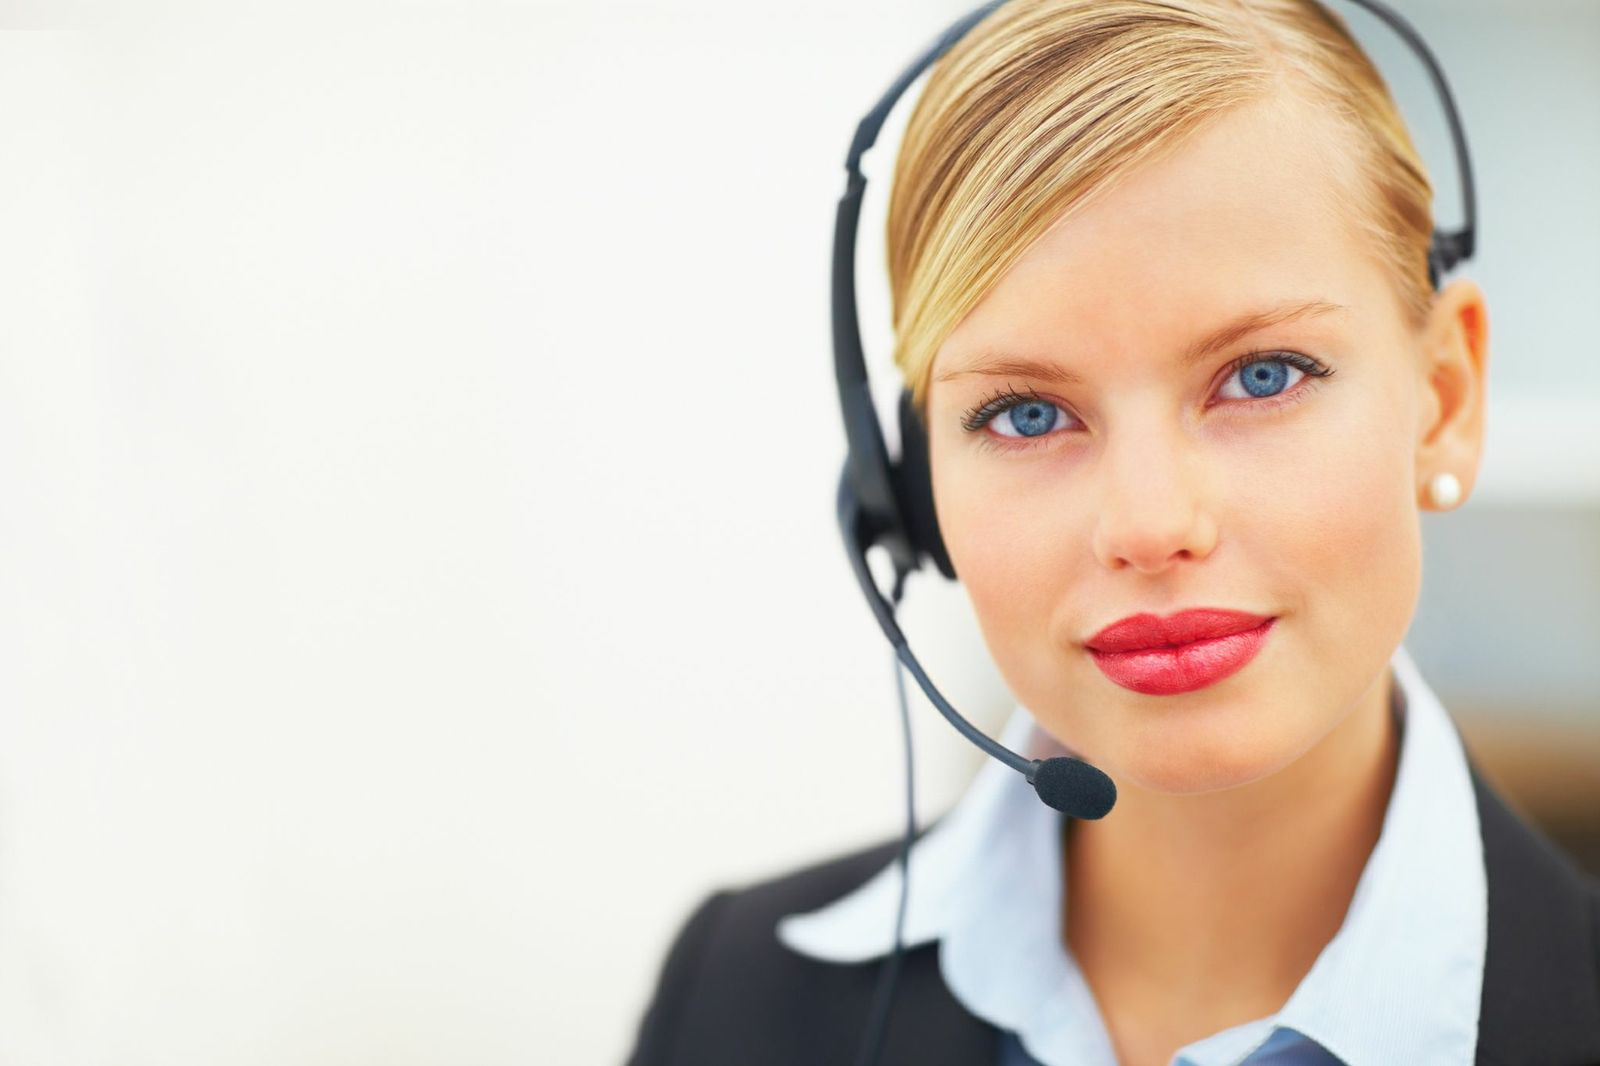 Call Center Representative Job Analysis